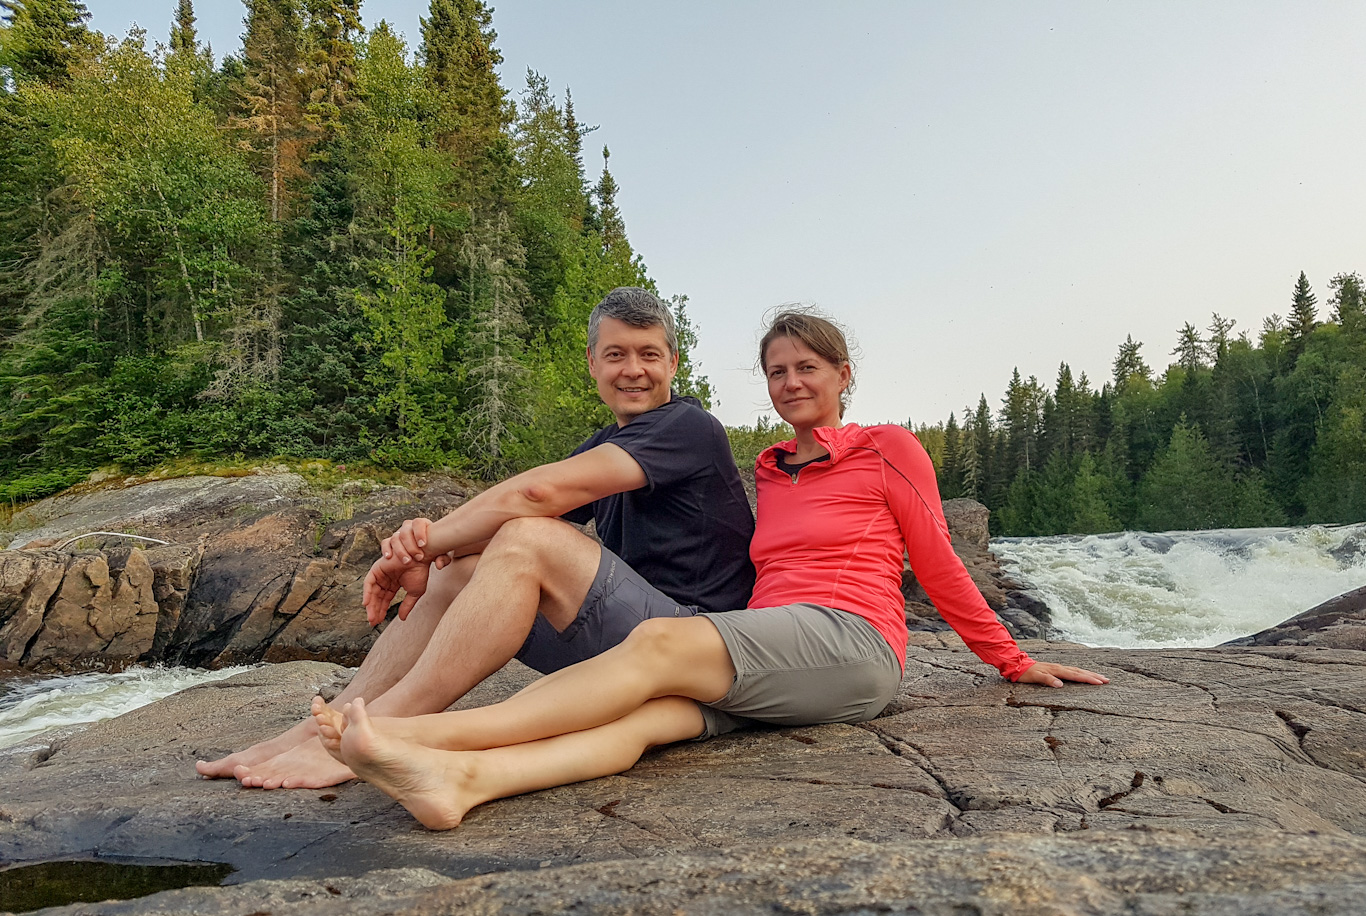 enjoying the evening at Hook Falls in Pukaskwa